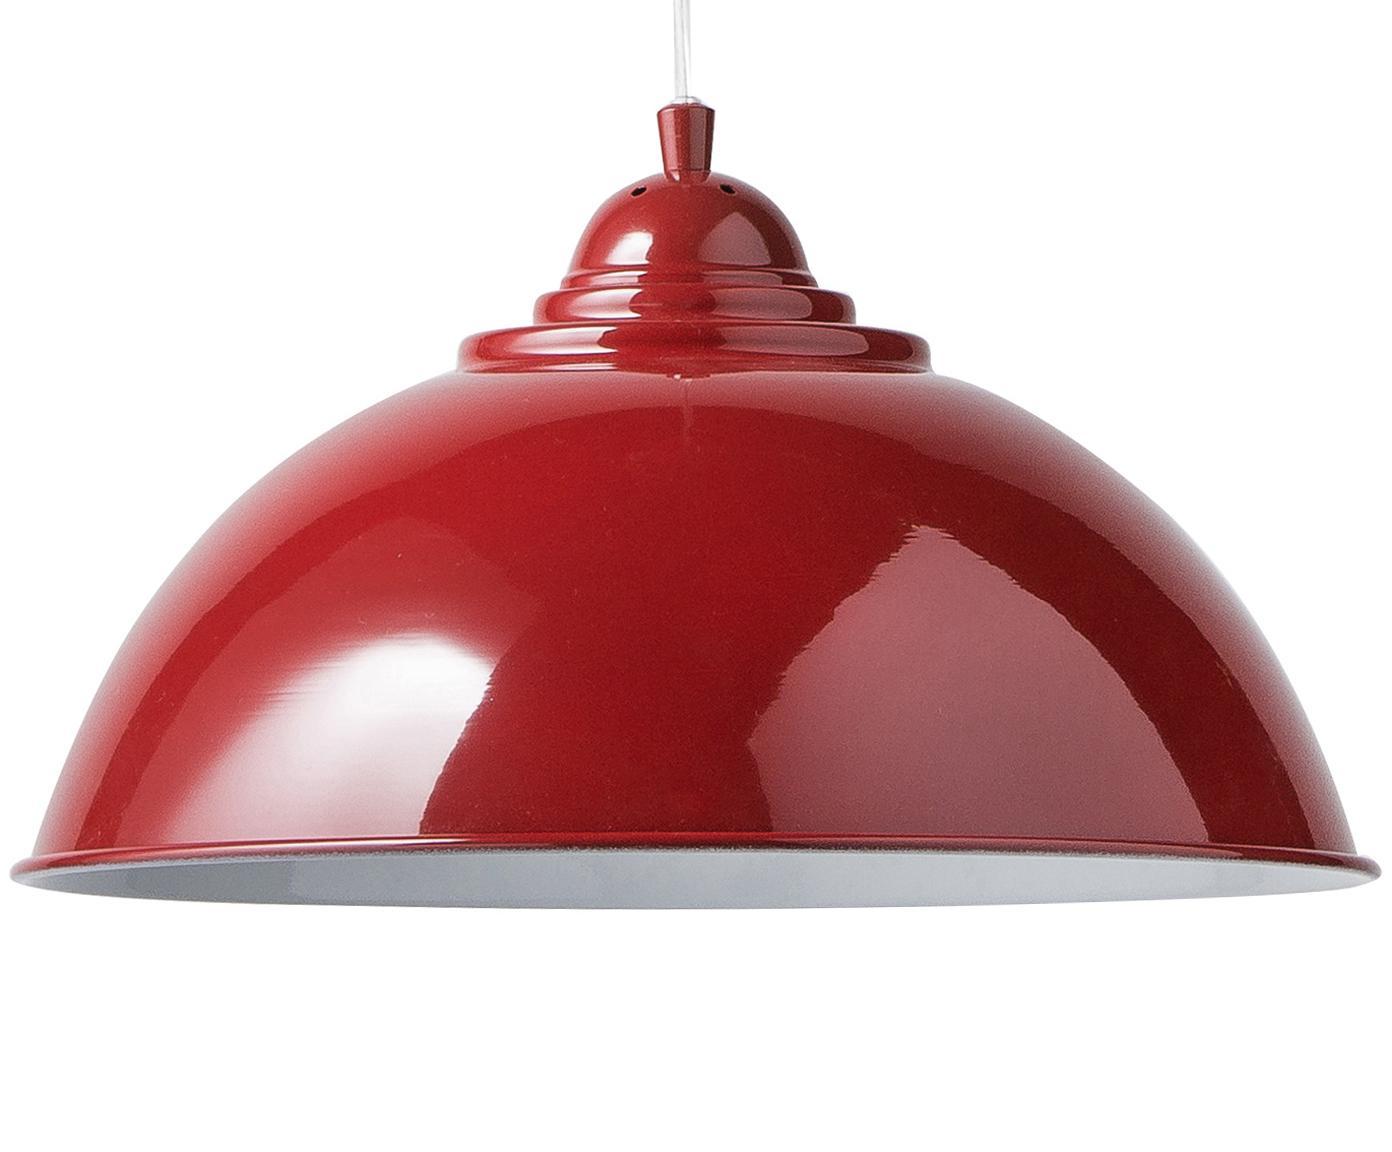 Retro hanglamp Fusion, Gelakt metaal, Baldakijn en lampenkap buitenkant: rood. Lampenkap binnenkant: wit, Ø 34 x H 20 cm